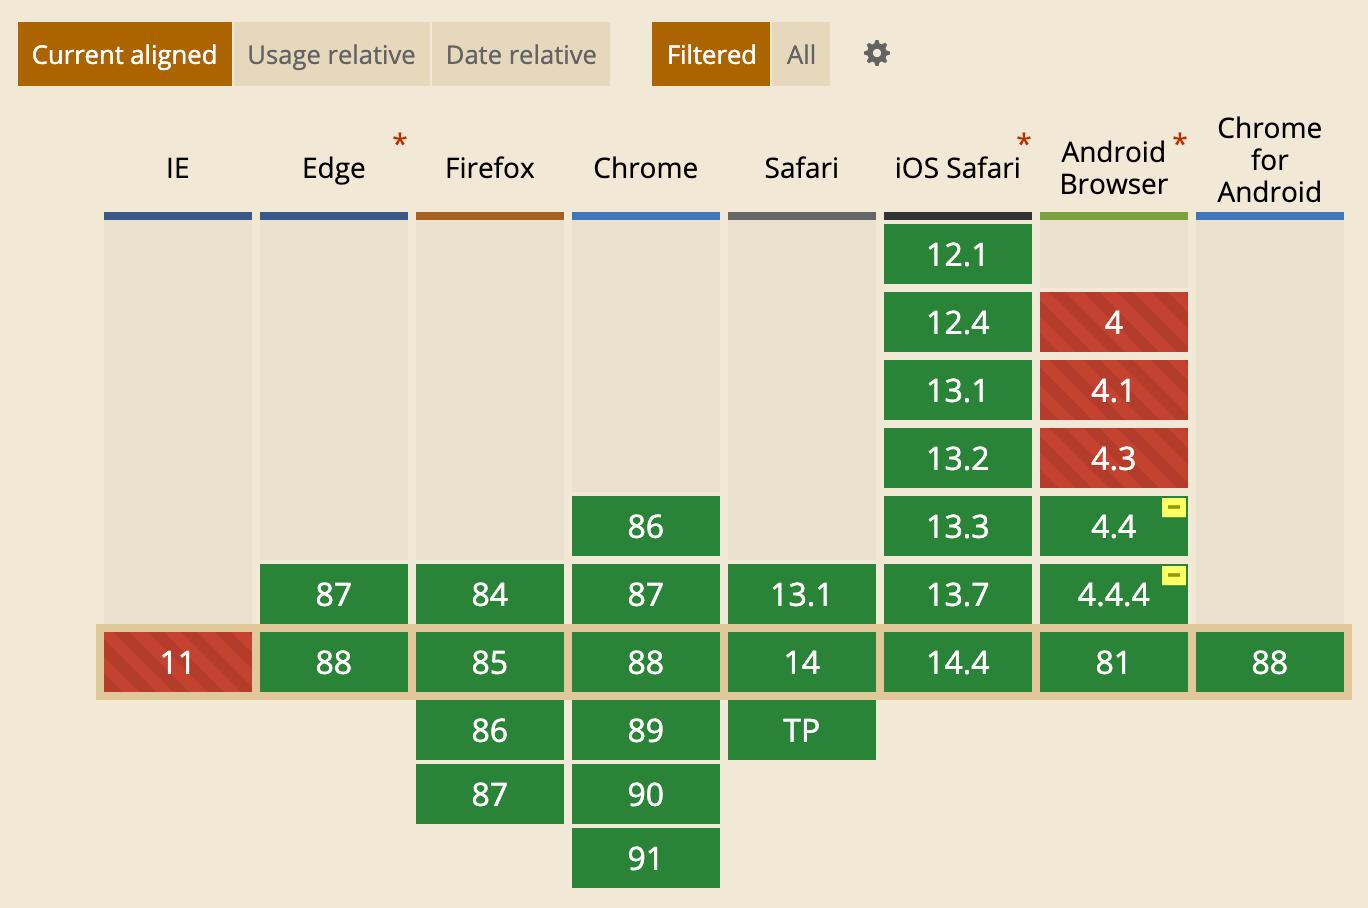 Can I useを使用するならfiltered設定をして見やすくするべし